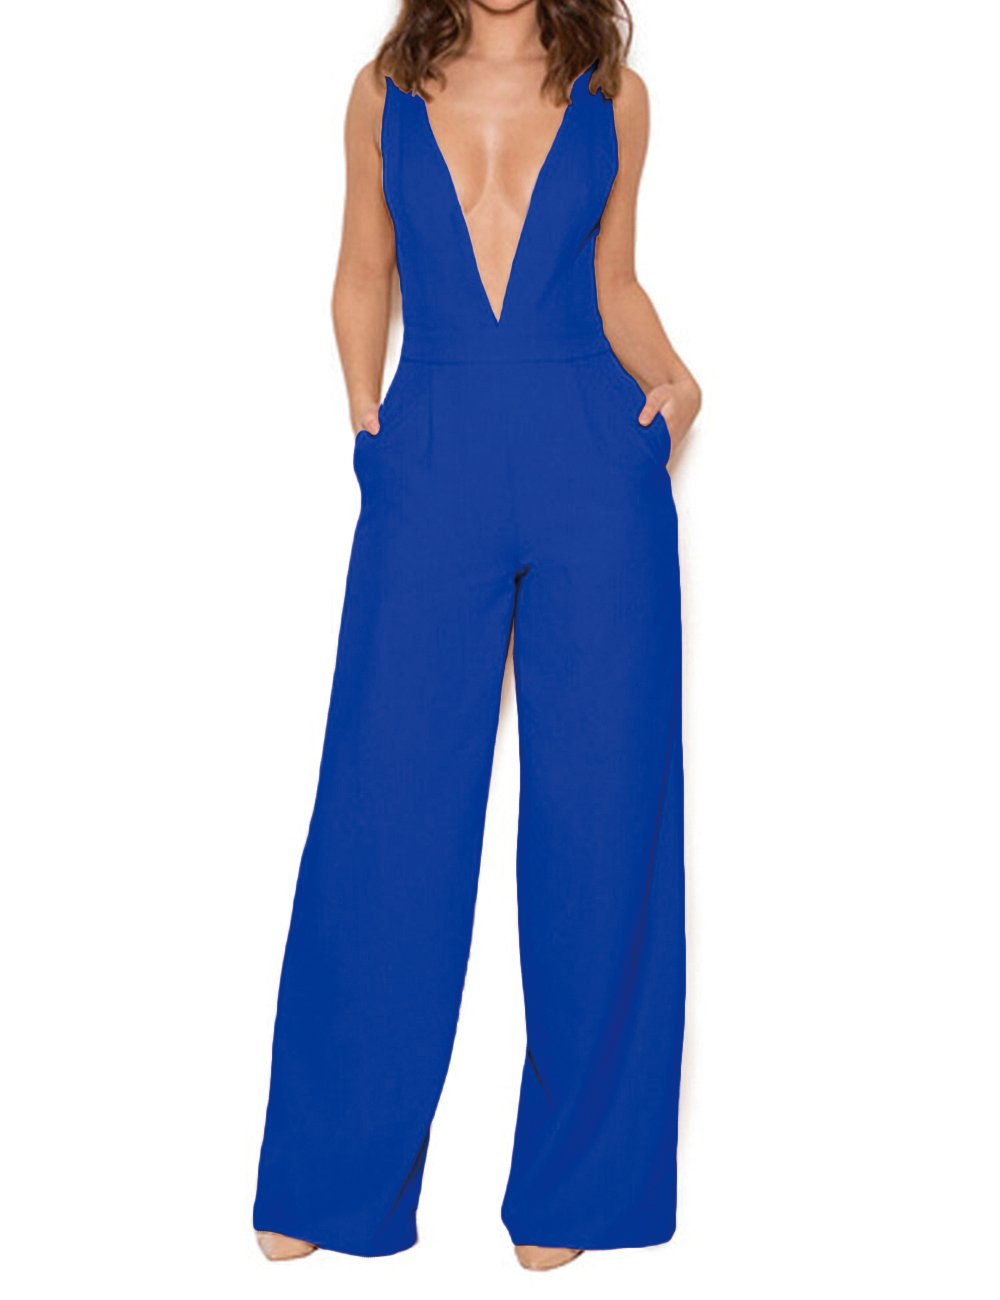 UONBOX Women's Sleeveless Elegant Deep V and Wide Leg Ladder Back Jumpsuit (L, Royal Blue)